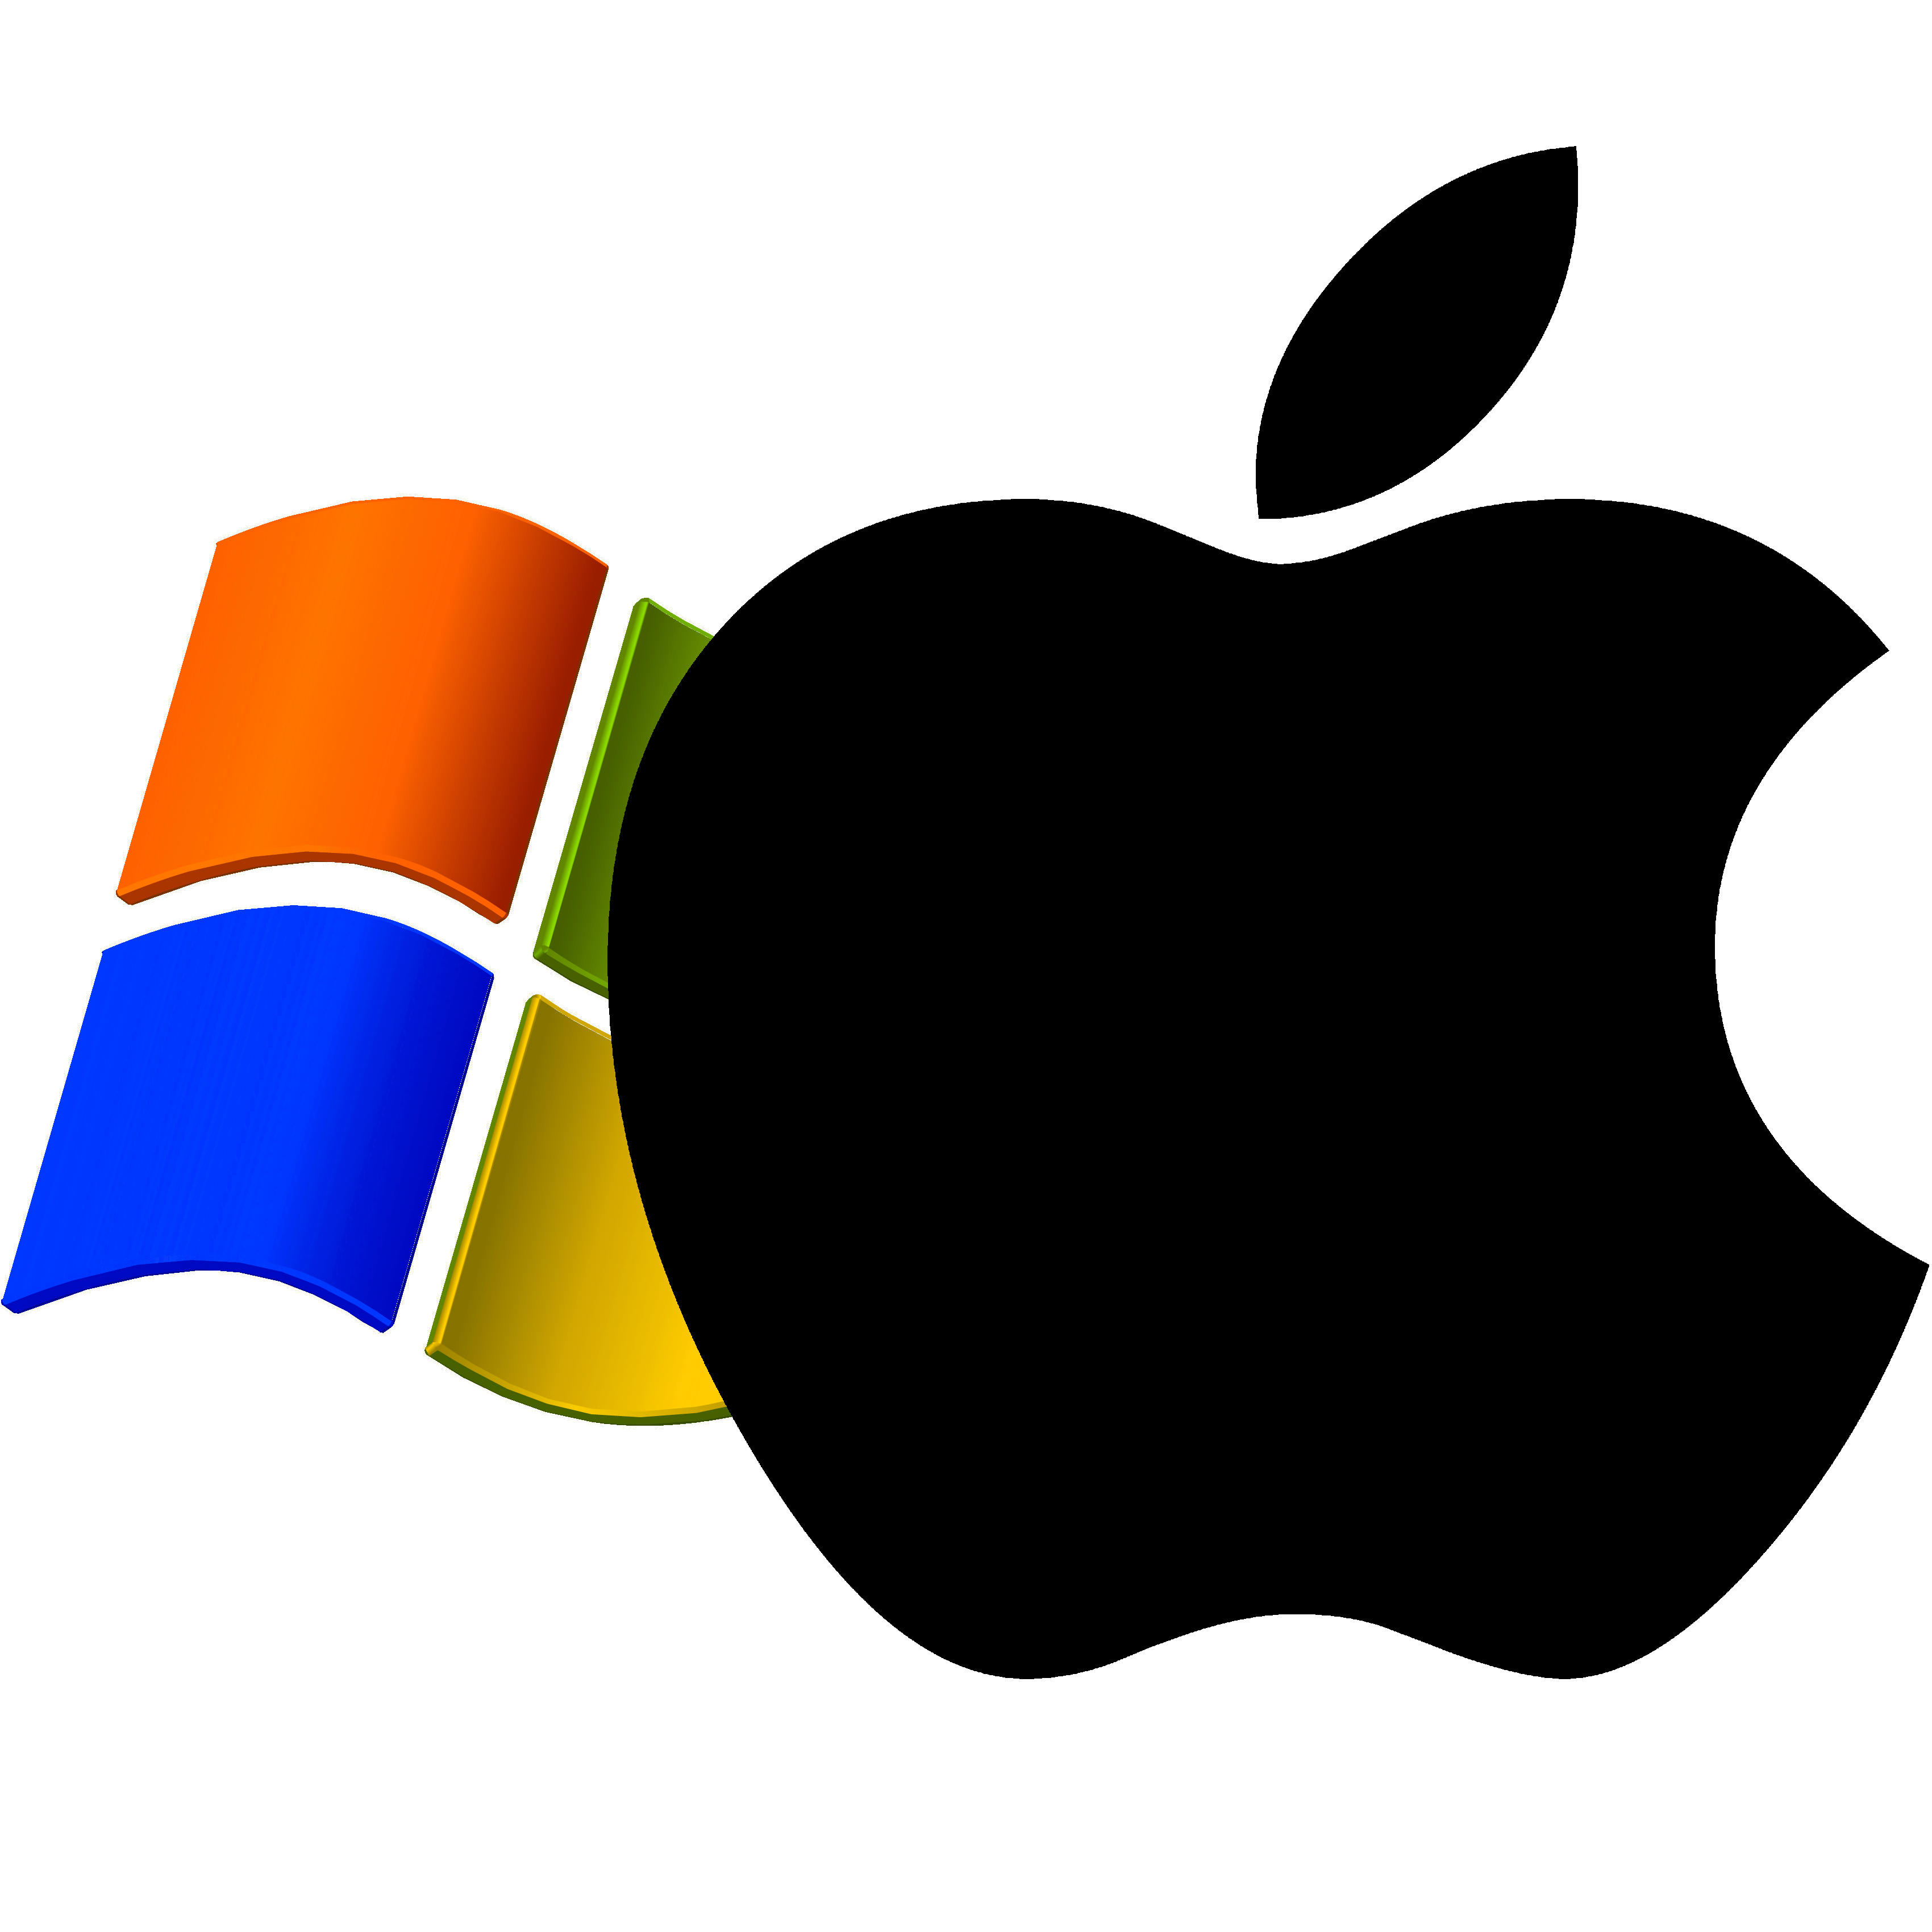 Windows XP logo superimposed by Apple logo   The Mac ... - Windows Apple Logo